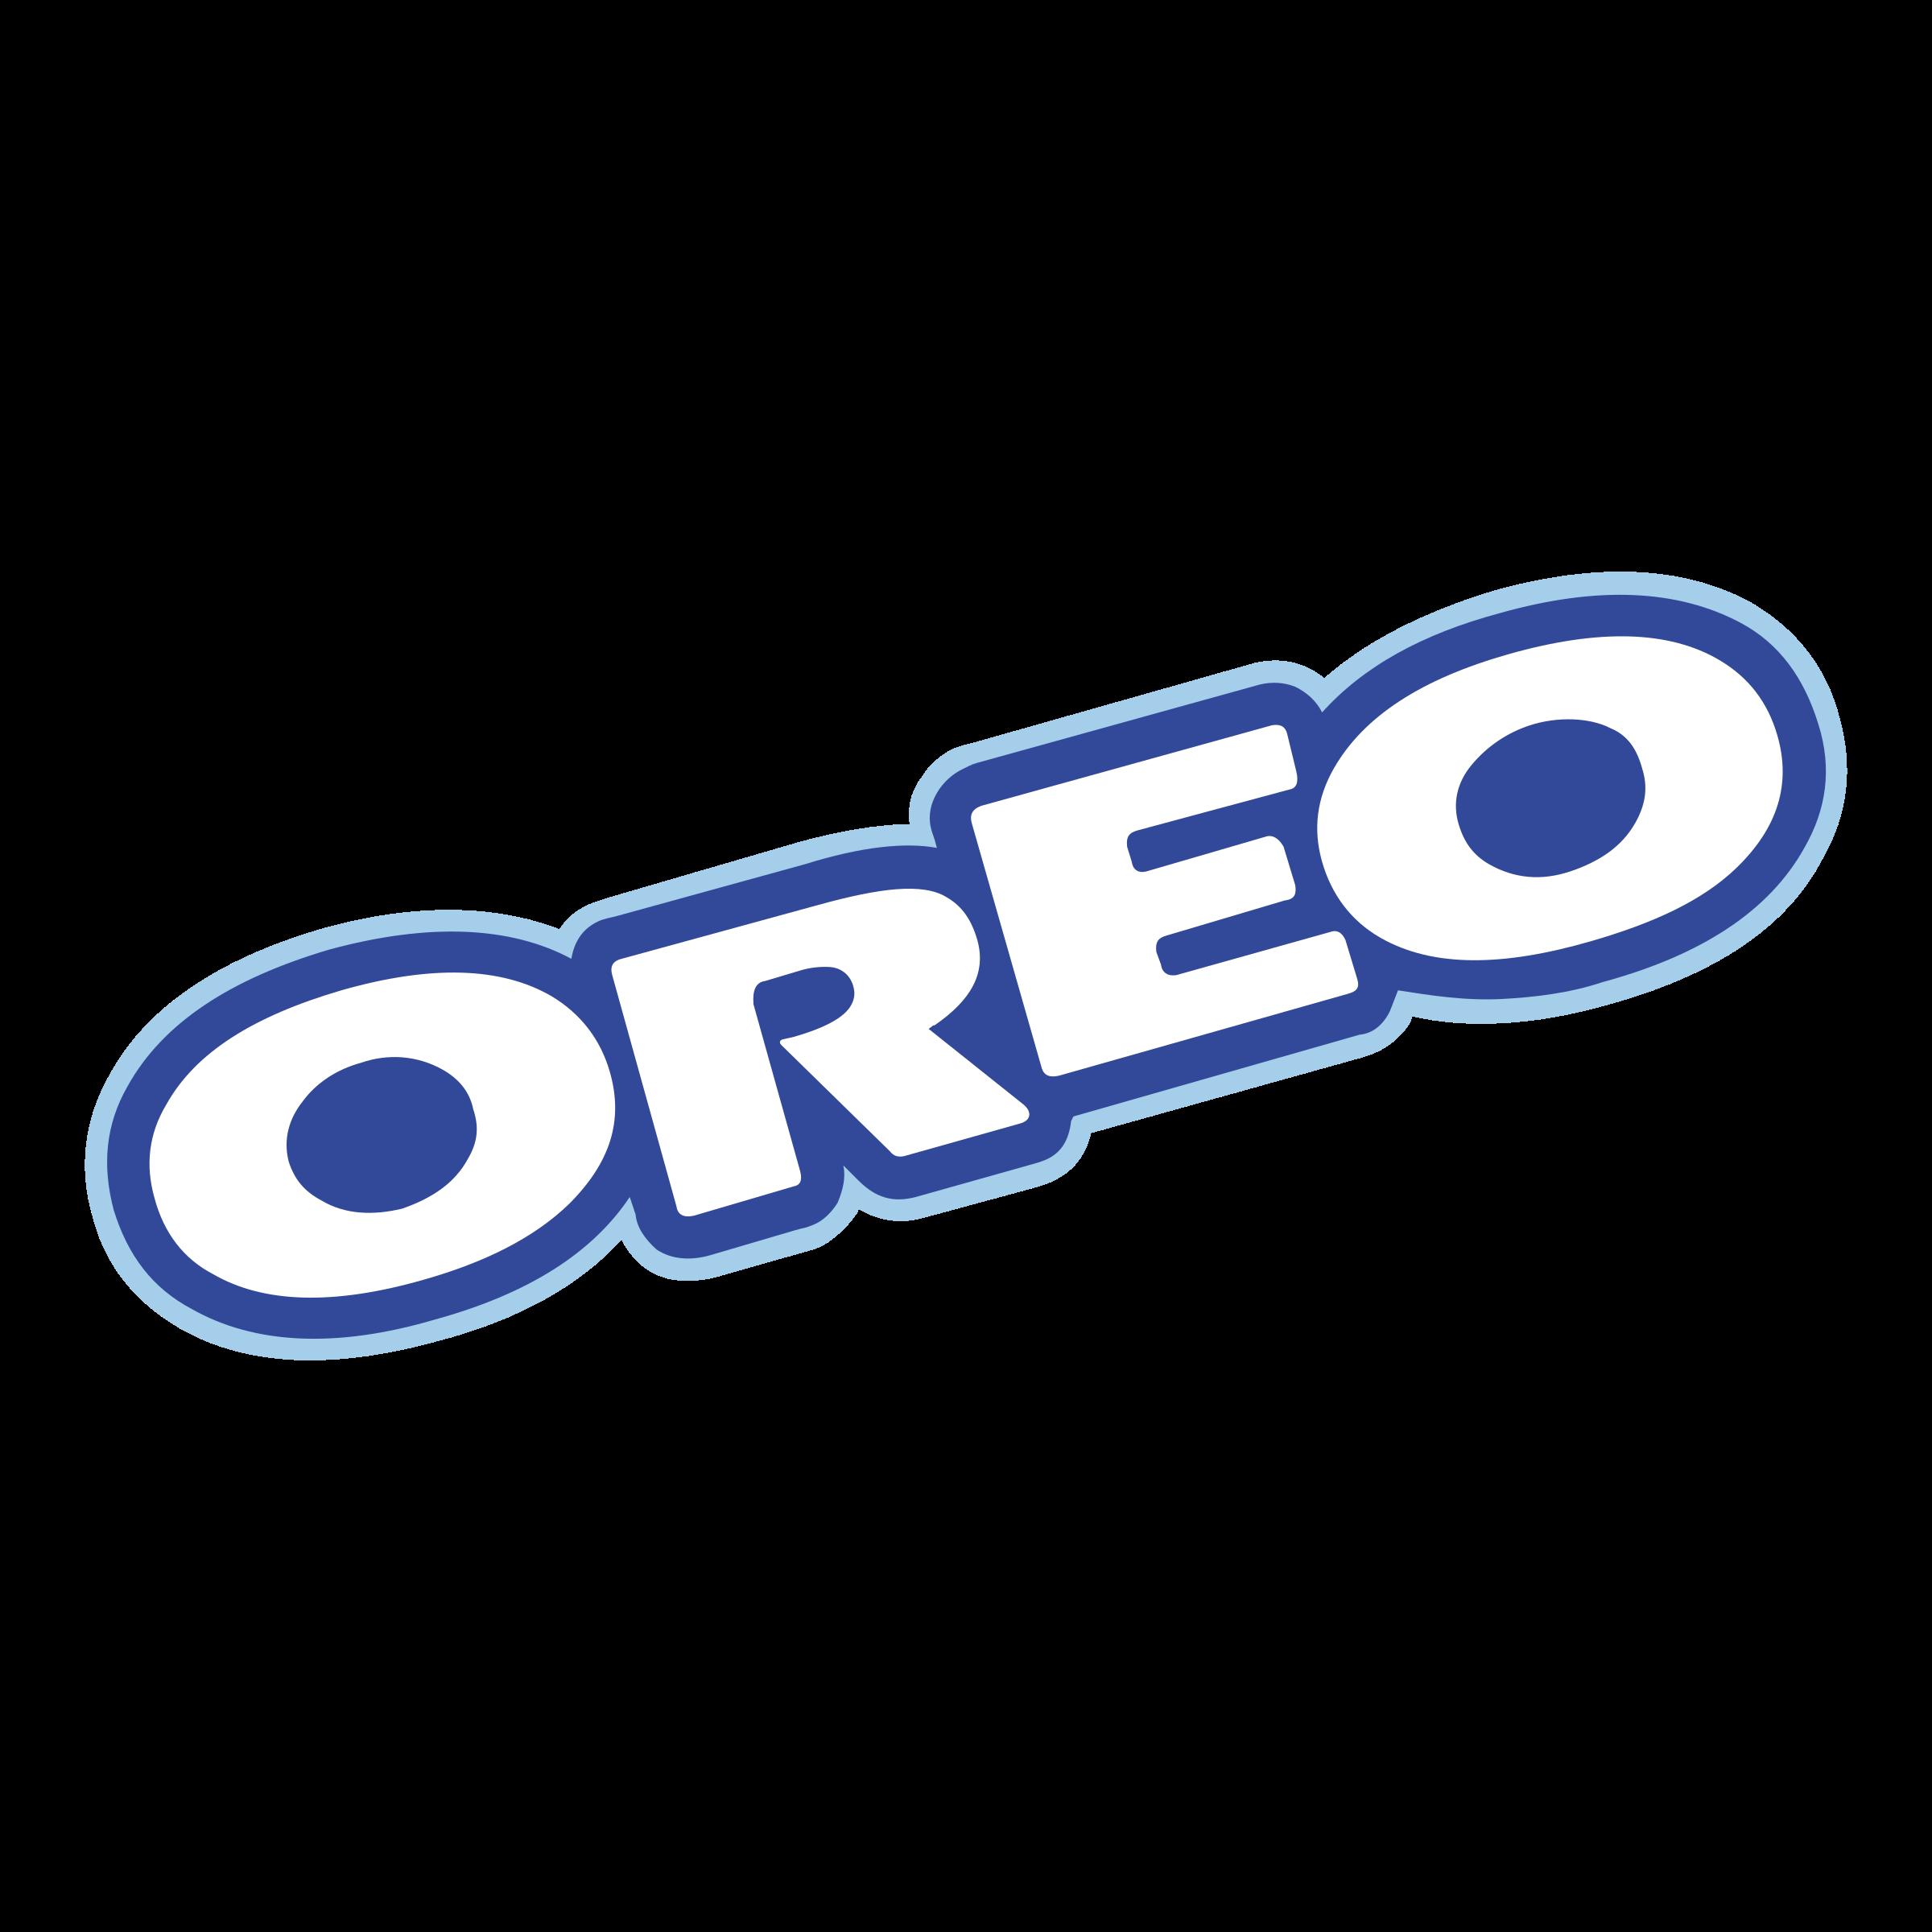 clipart freeuse stock Oreo Logo PNG Transparent